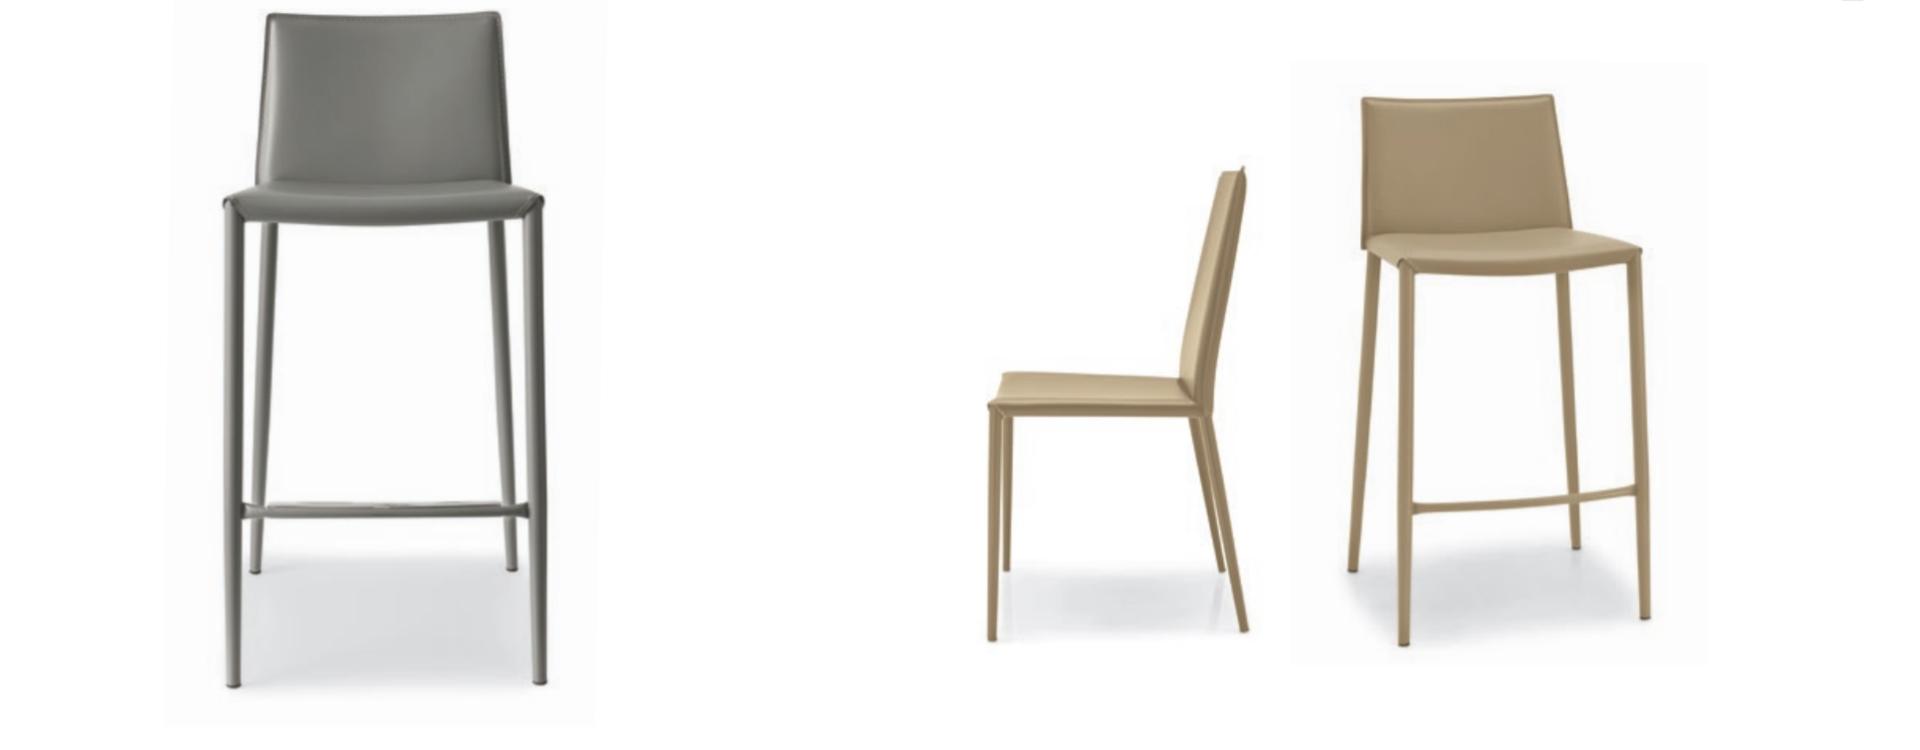 basad sillas taburetes cresan.1png